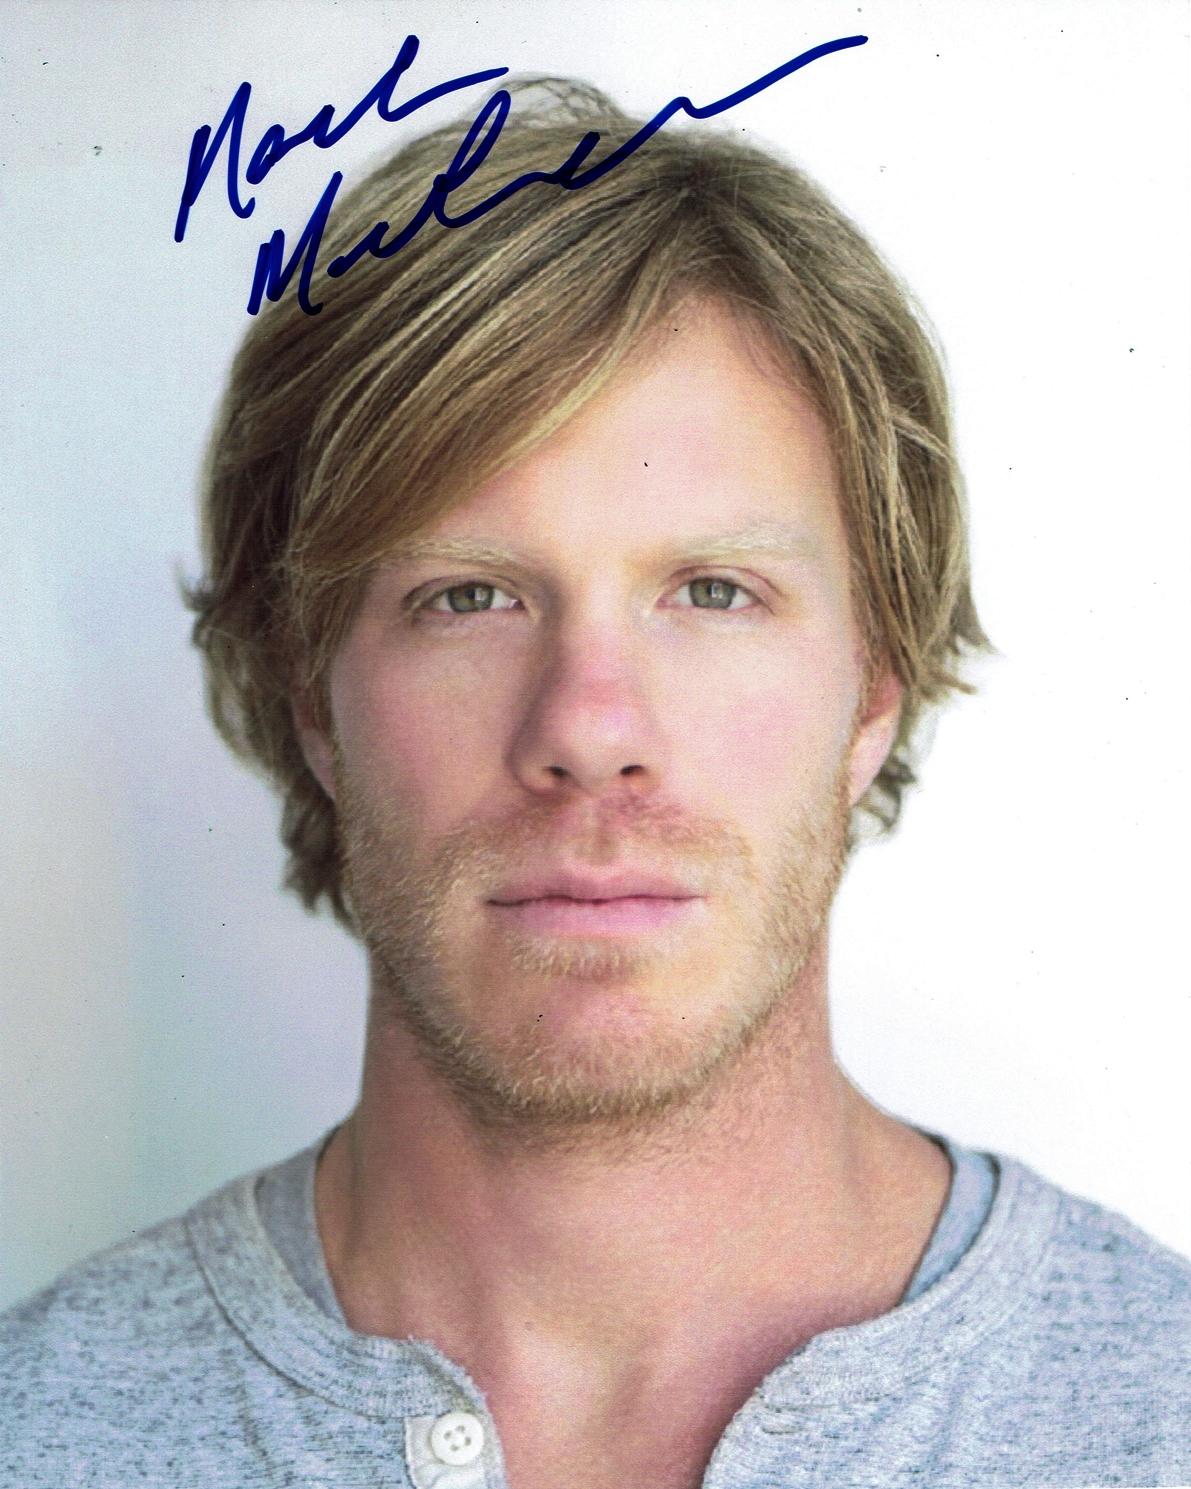 Marc Menchaca Signed Photo